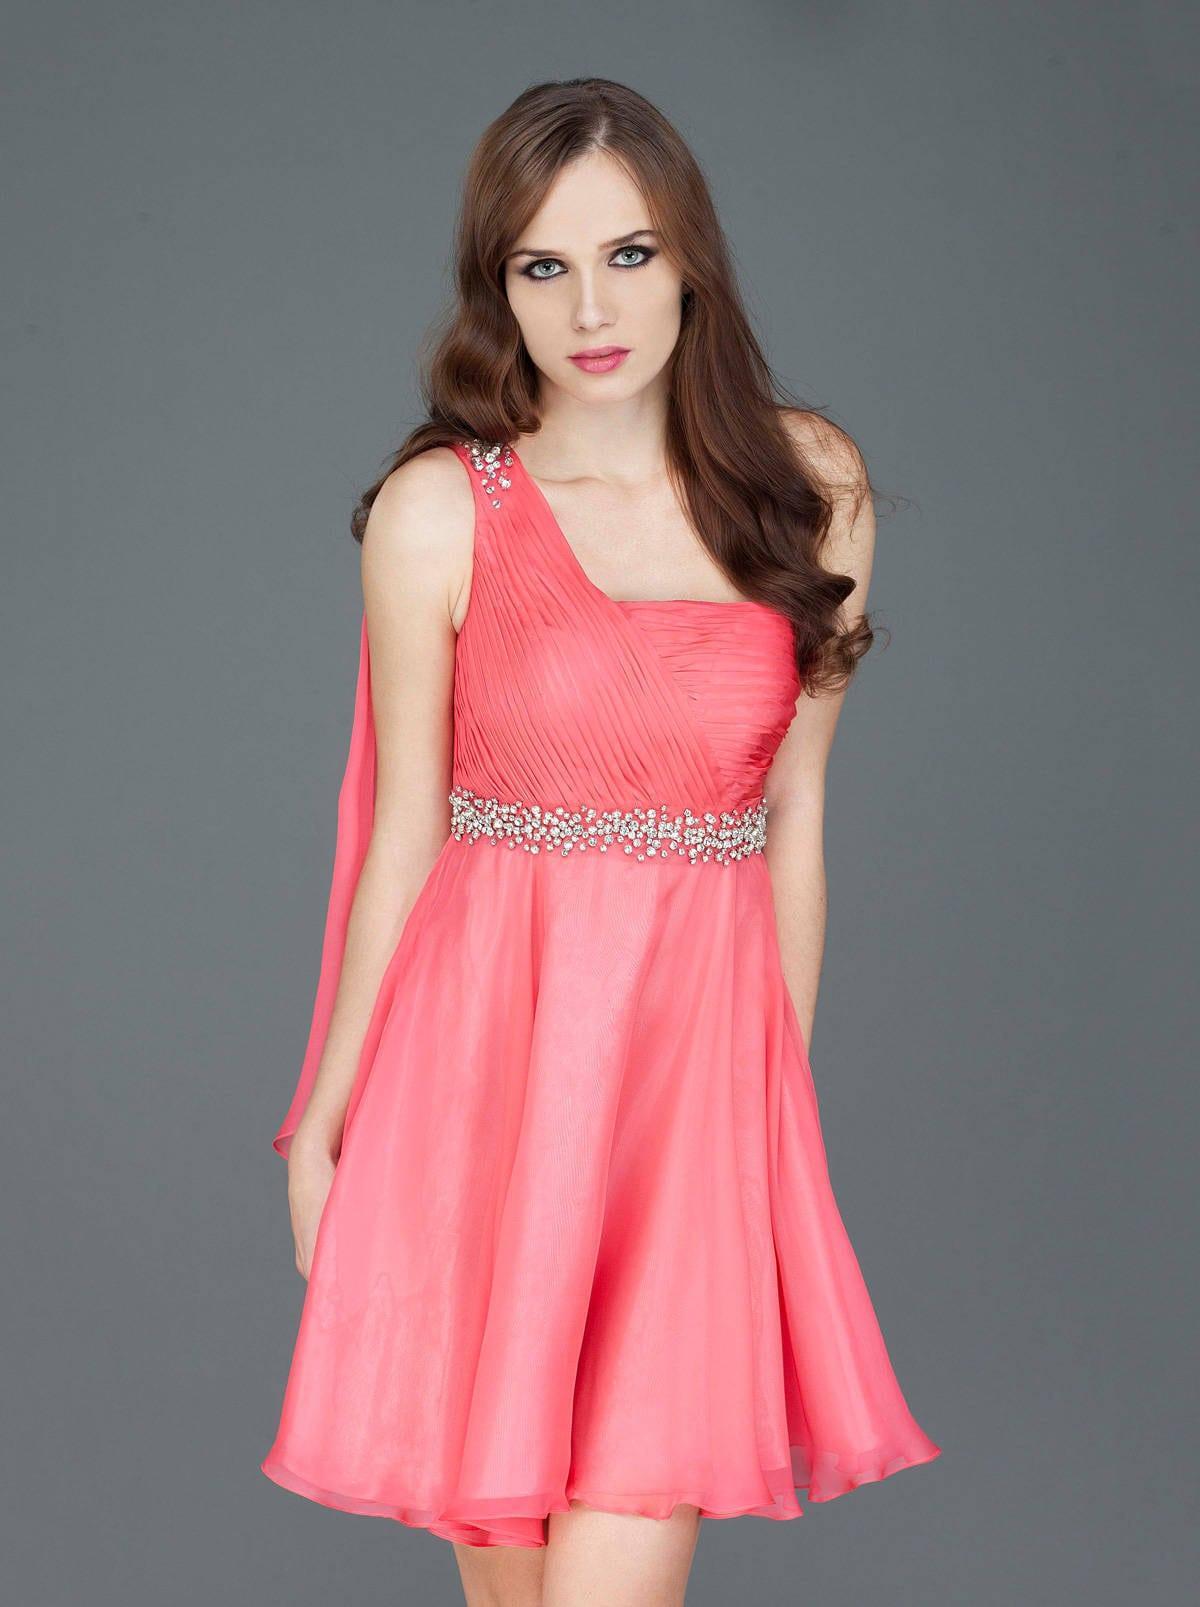 Vestido rosa pastel para la madre de la novia